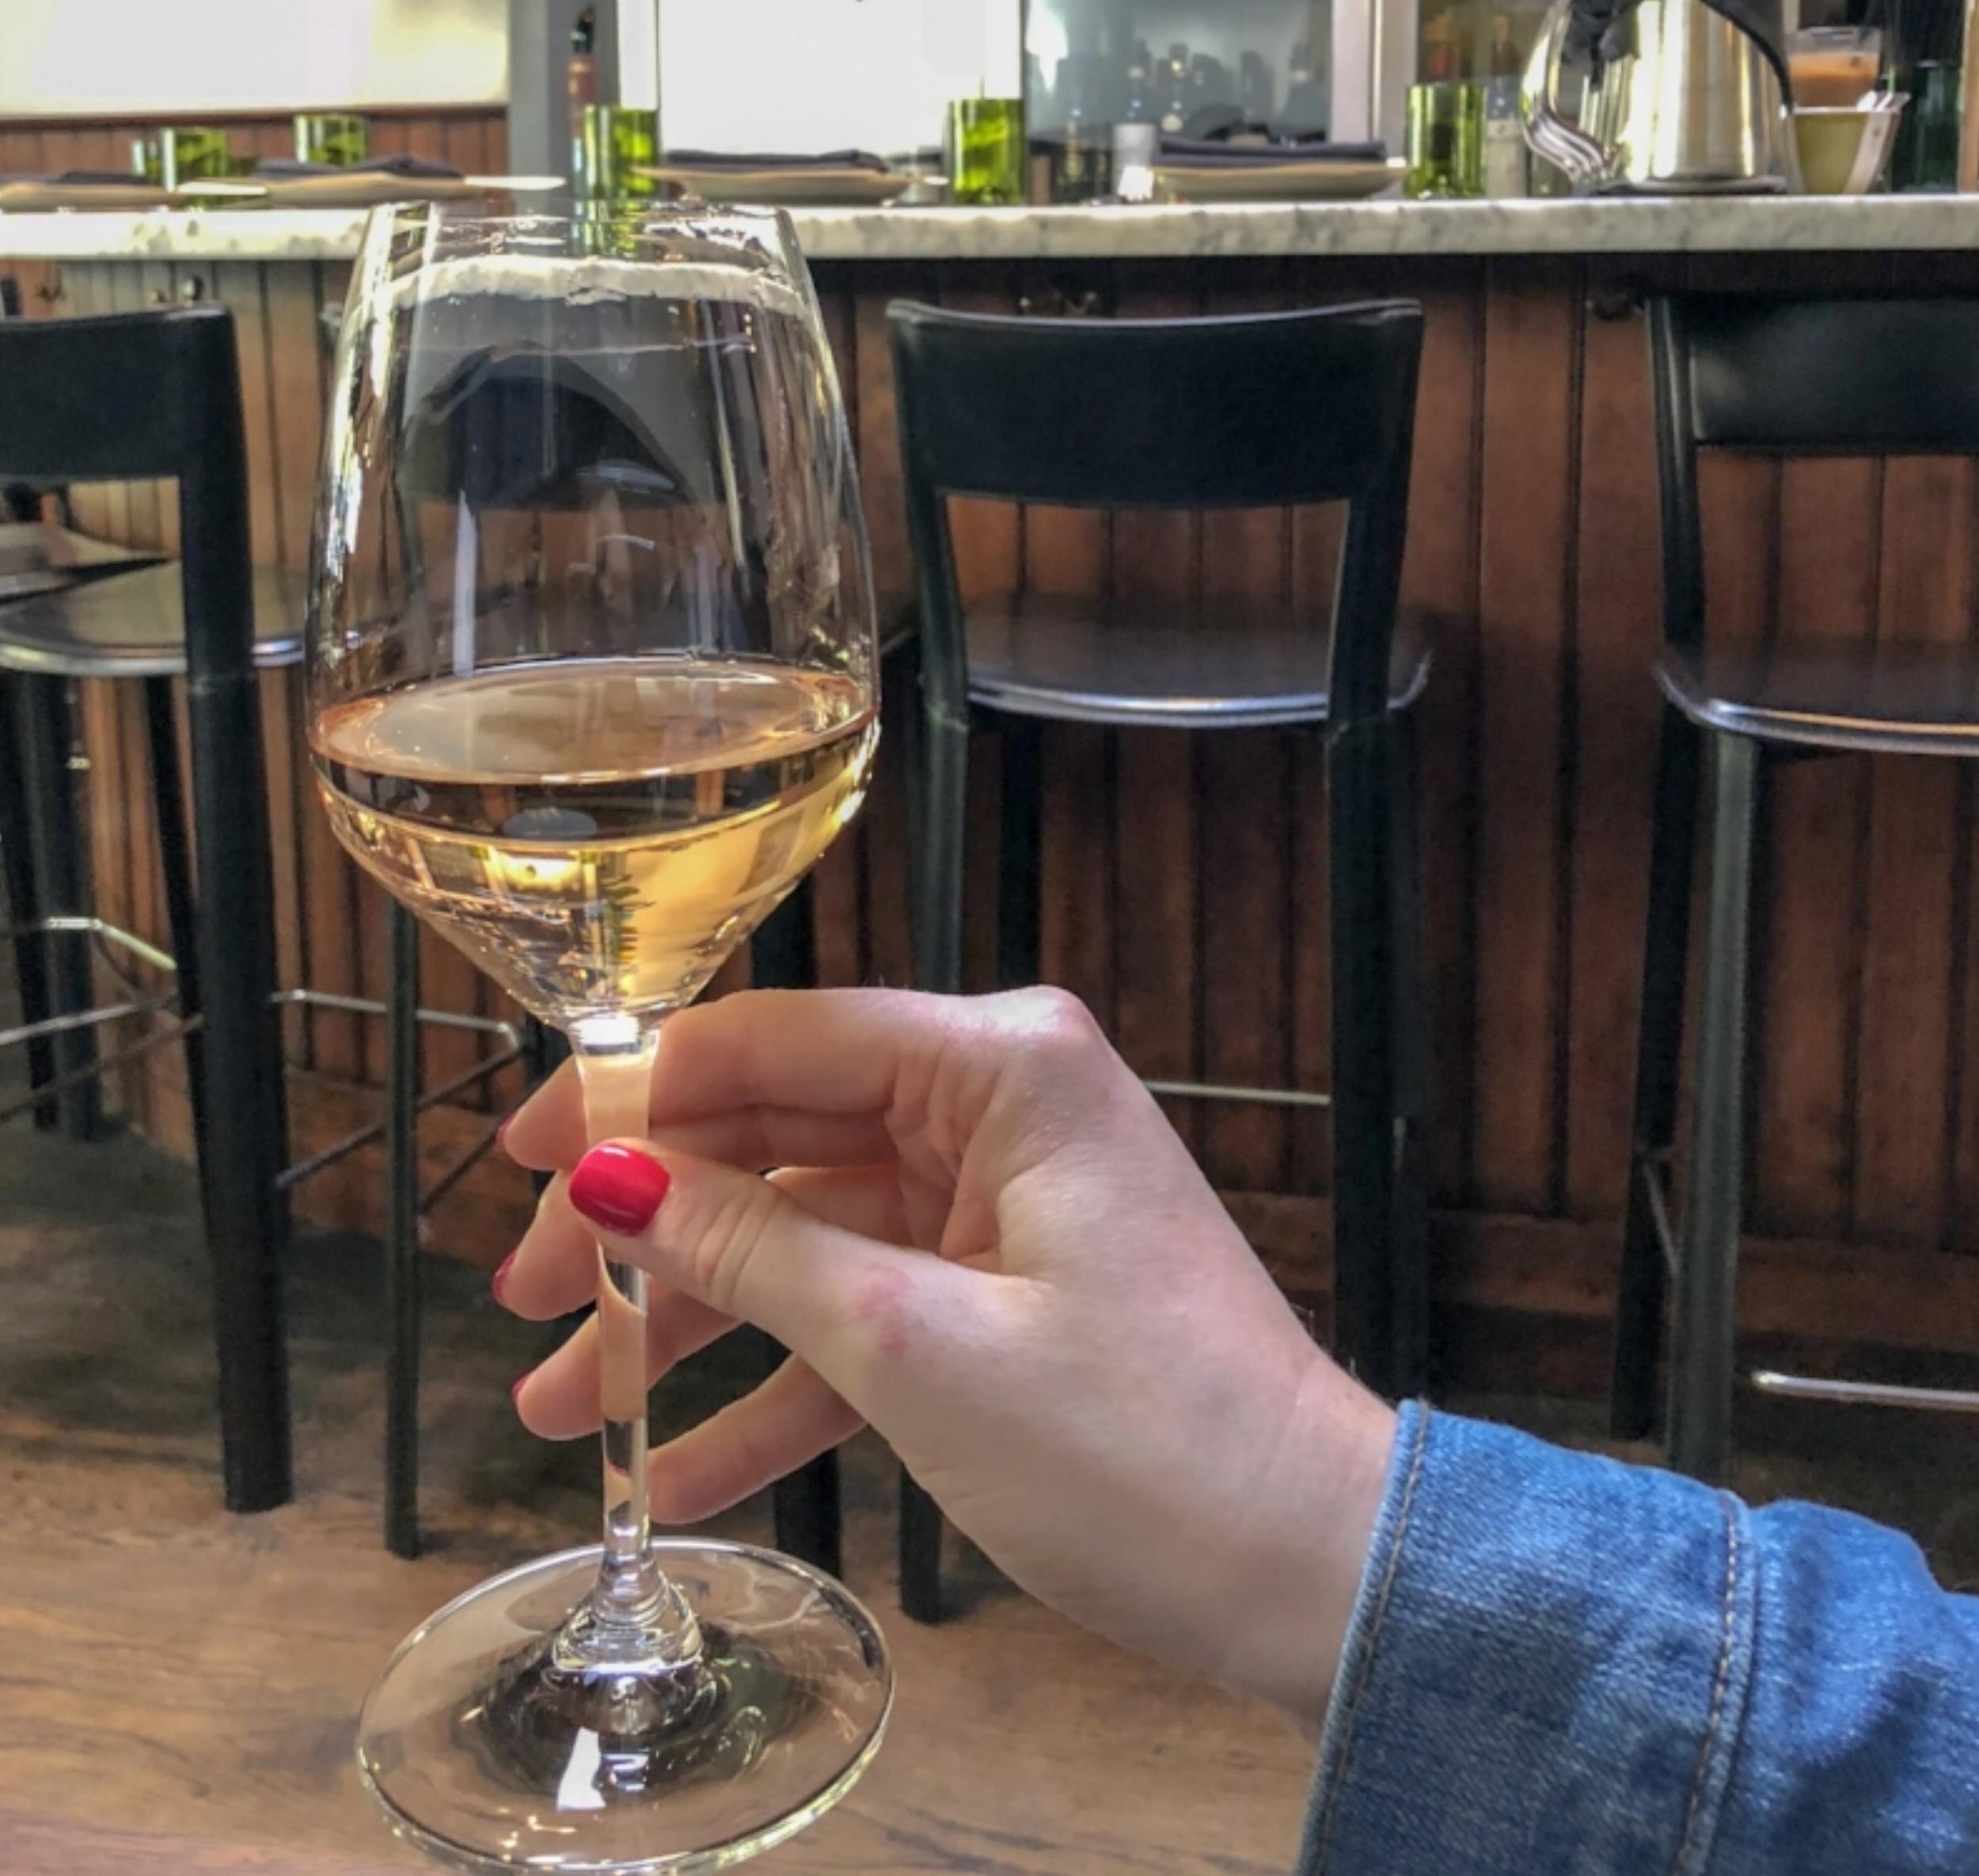 calistoga travel guide, what to do in calistoga, where to eat in calistoga, where to drink wine in calistoga, visit napa valley, napa valley travel guide, sonoma, visit california